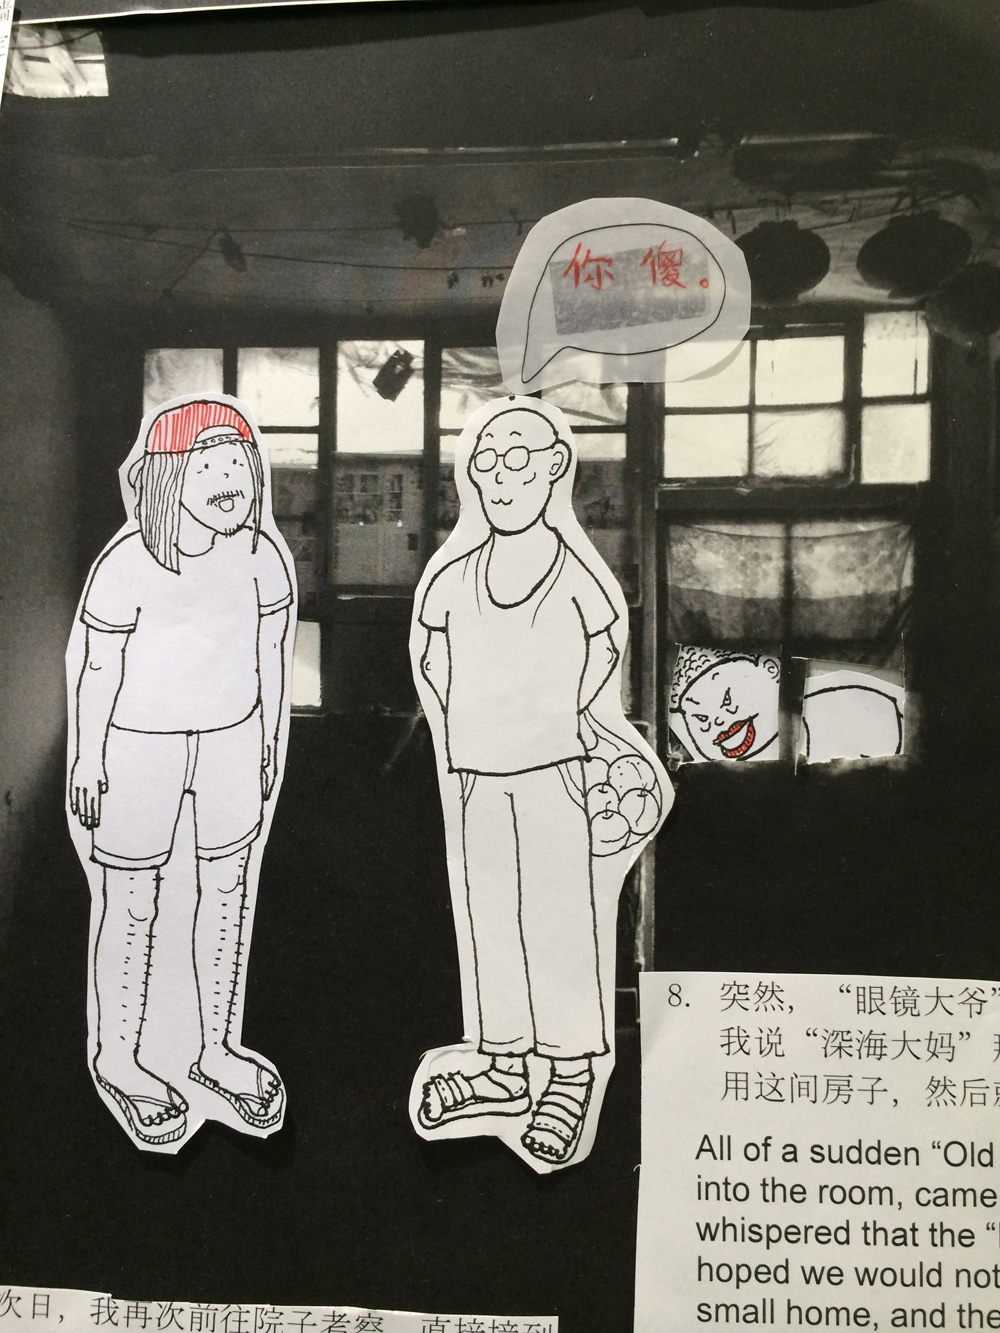 Caopu-humble-hostel-story-hisheji (8)